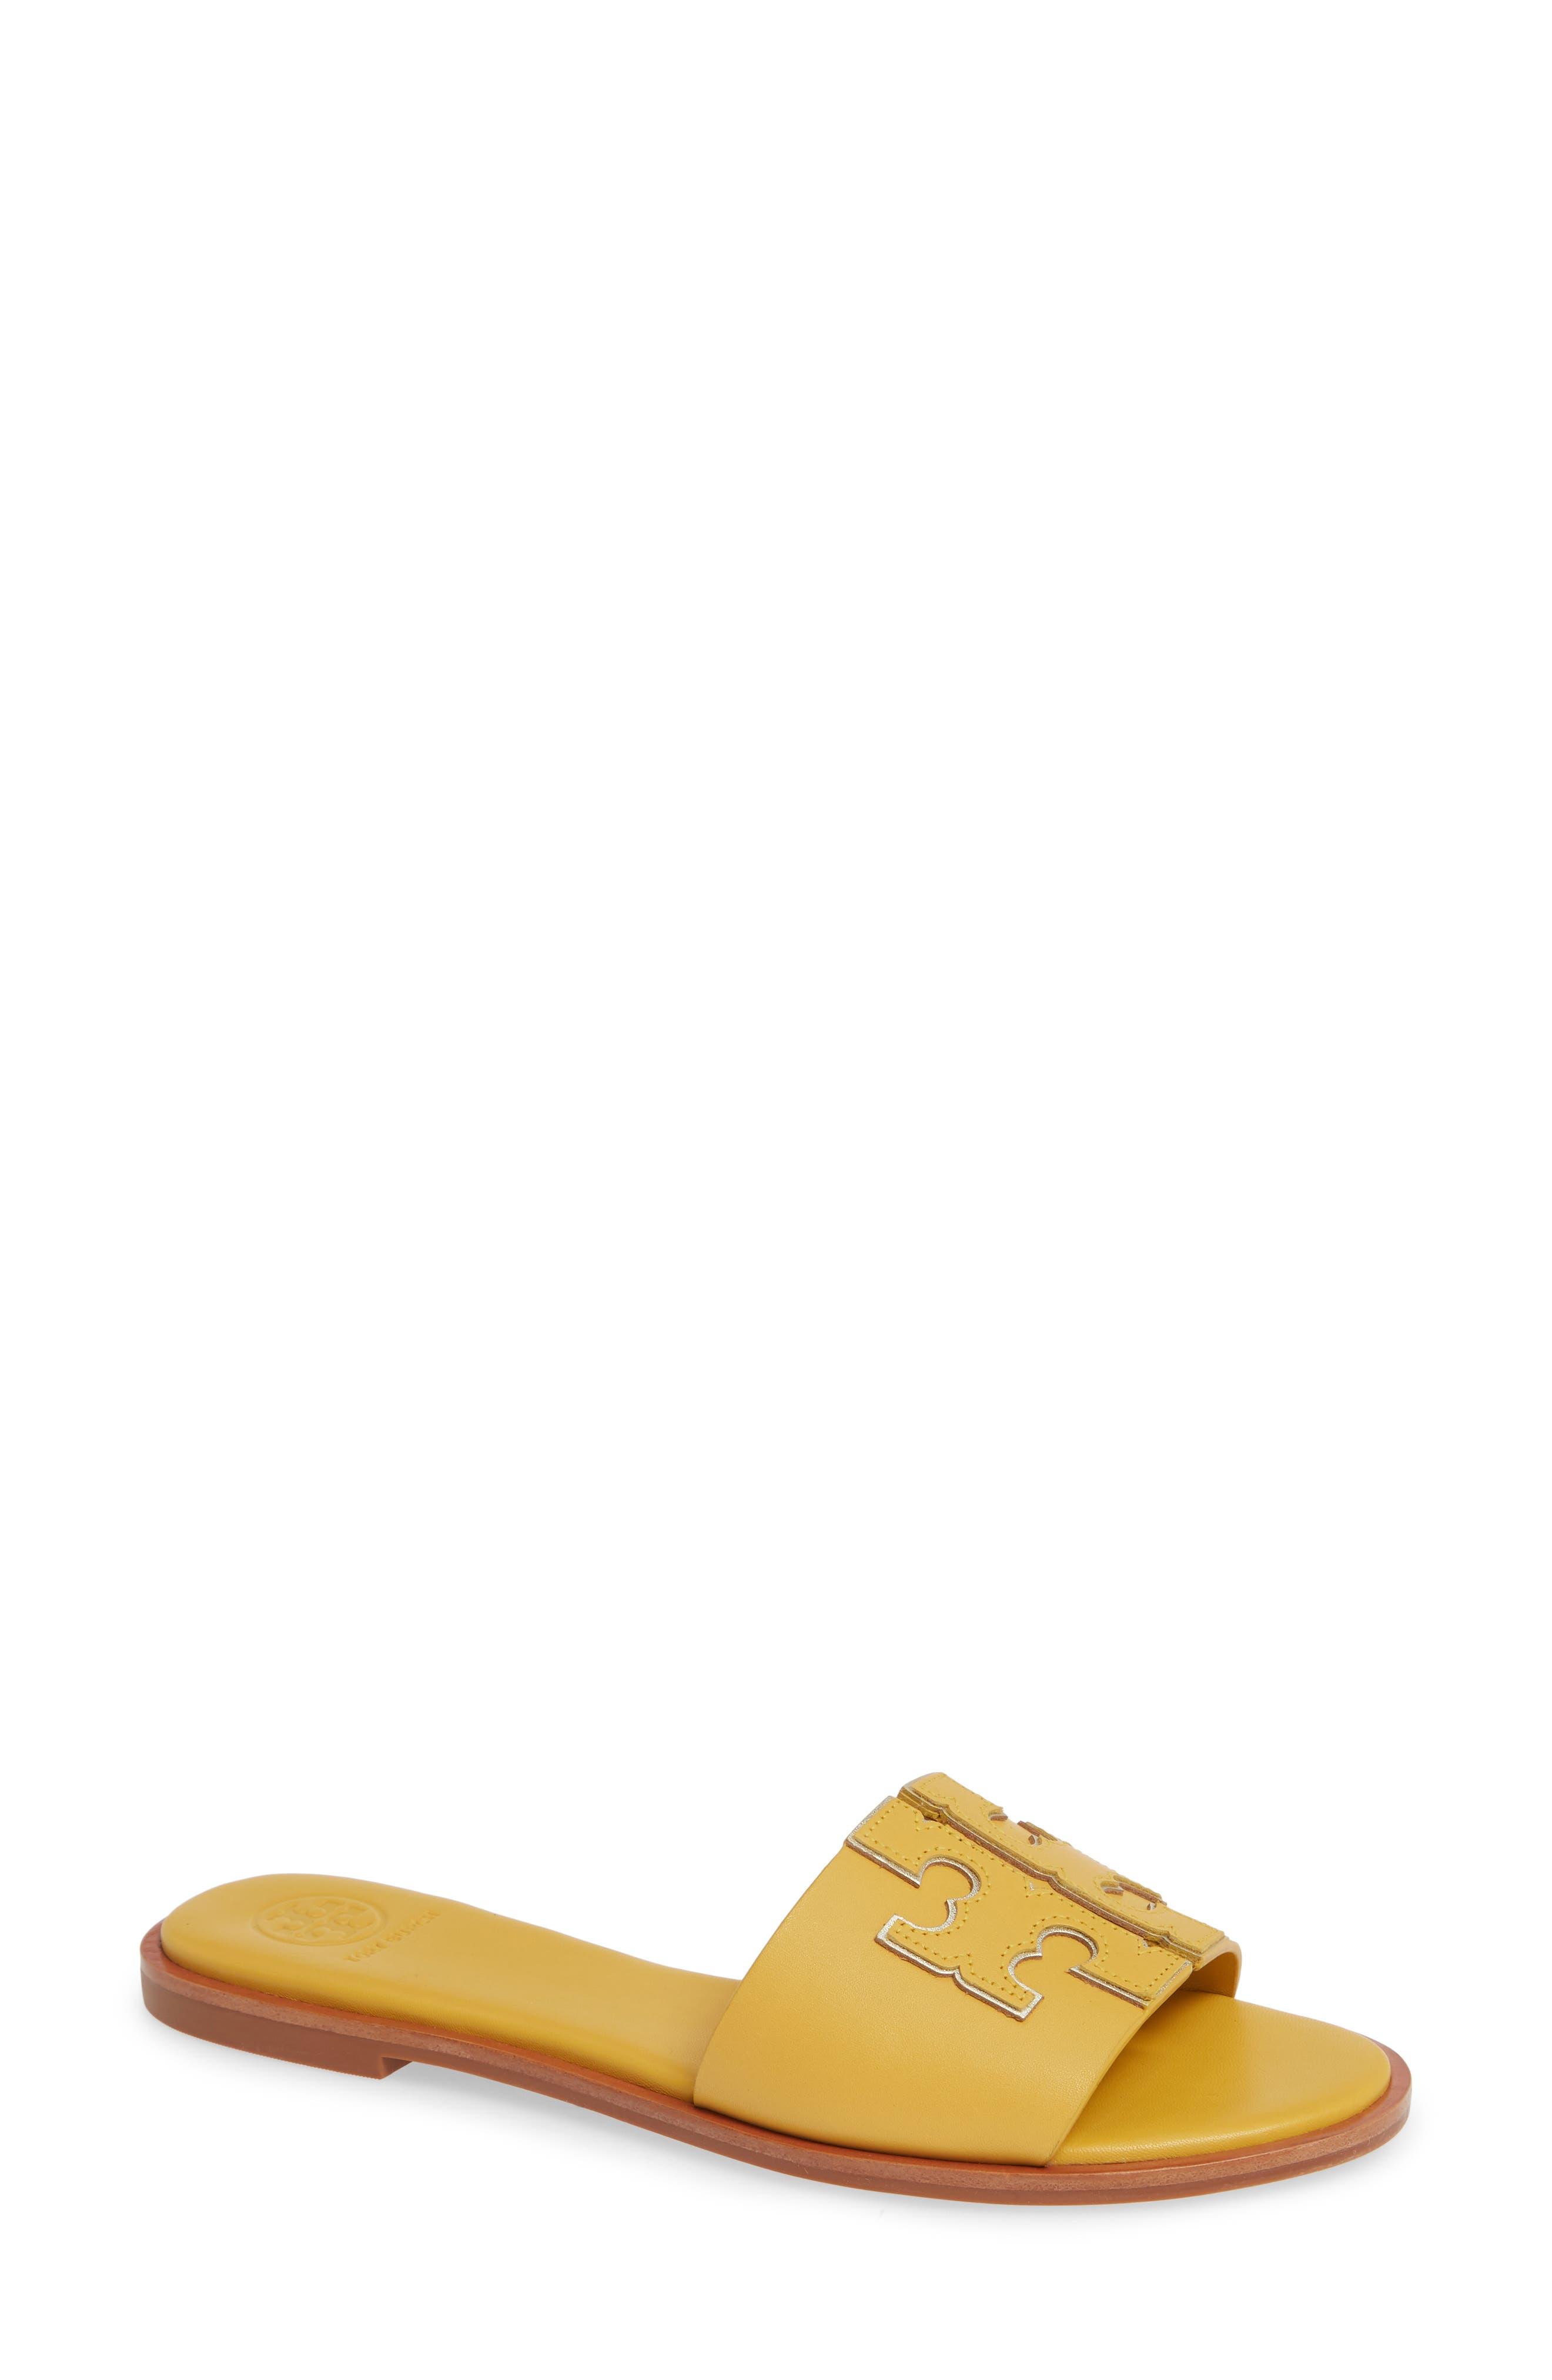 Tory Burch Ines Slide Sandal, Metallic